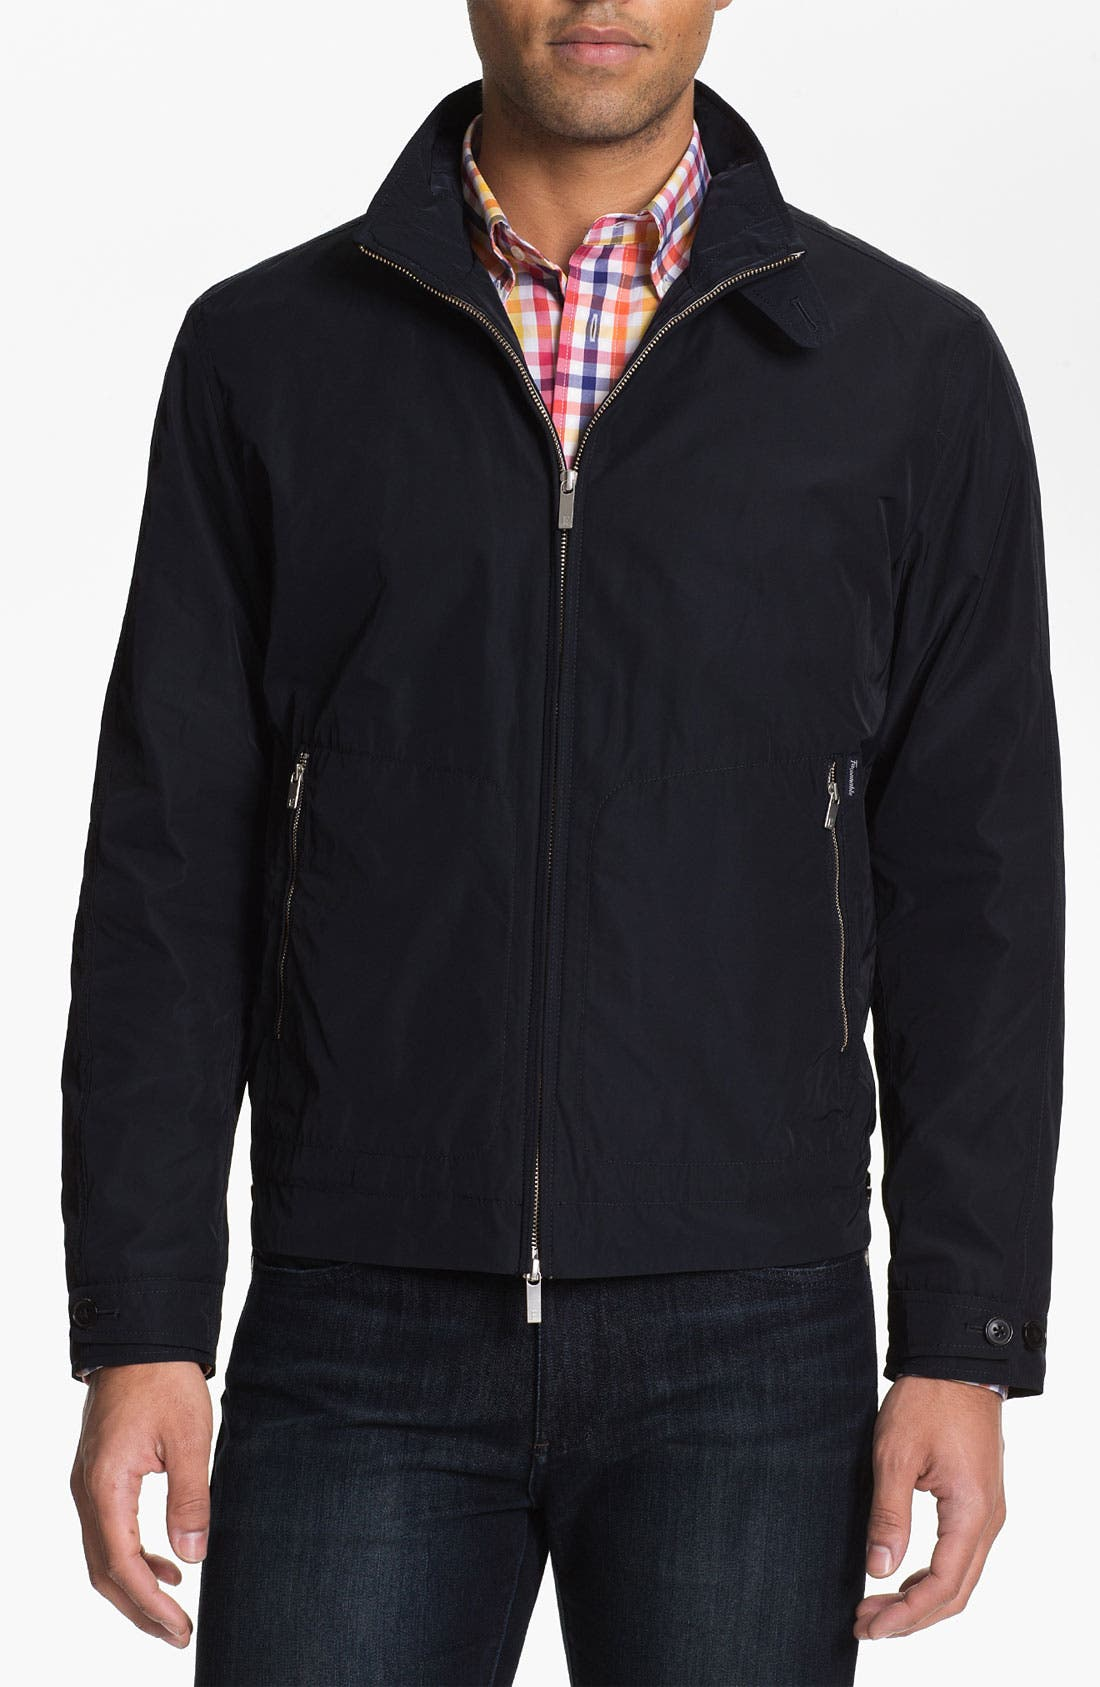 Alternate Image 1 Selected - Façonnable Open Bottom Jacket